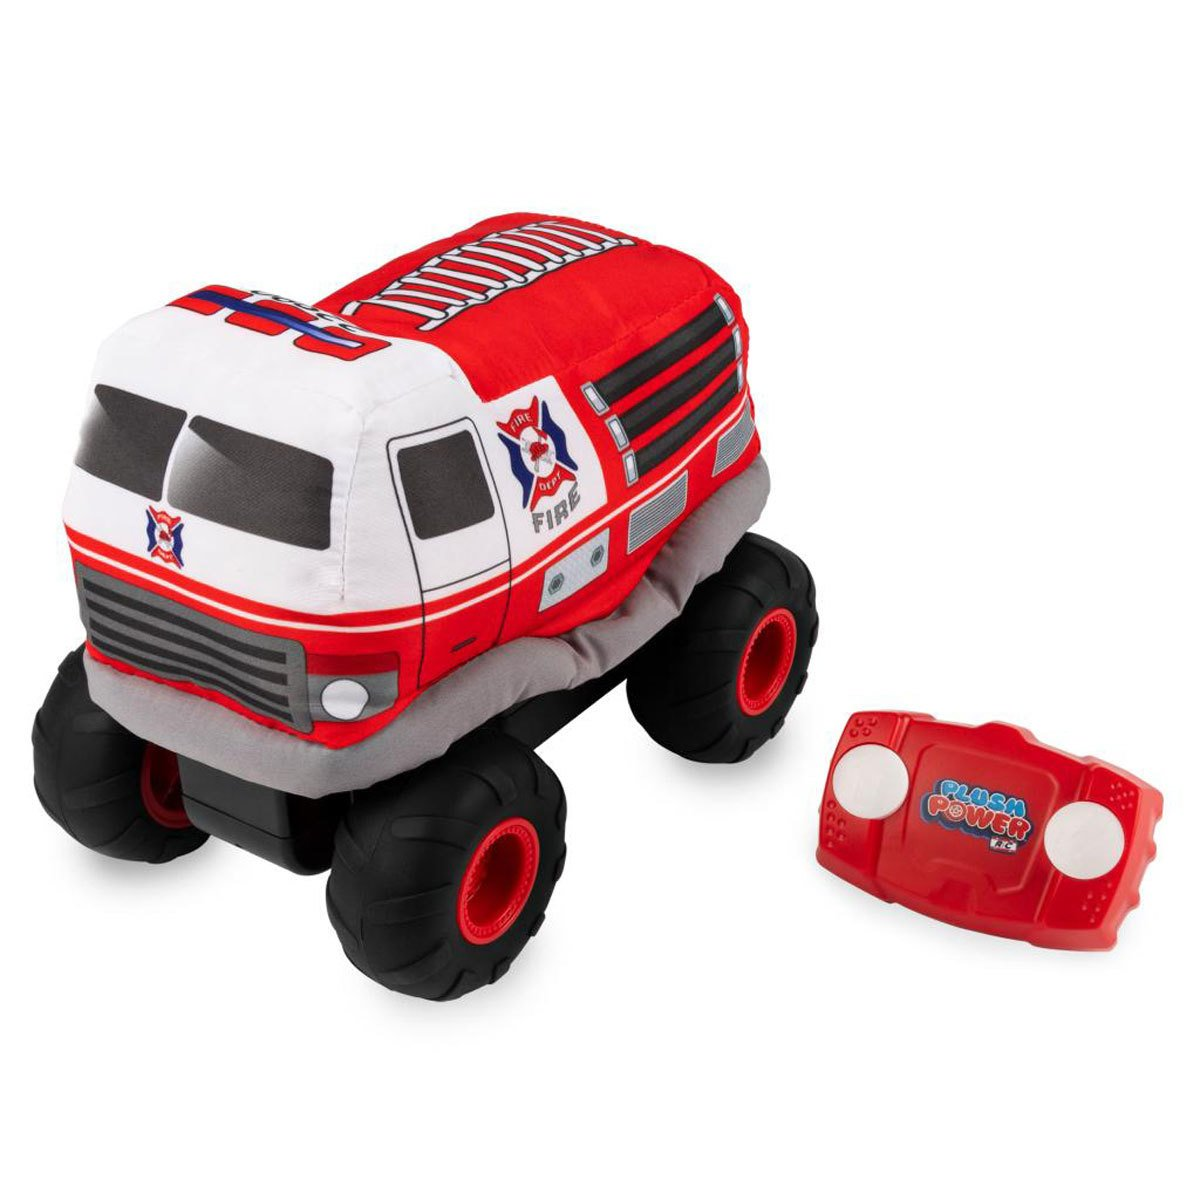 Plush Power R/C - Fire Truck (6055131)